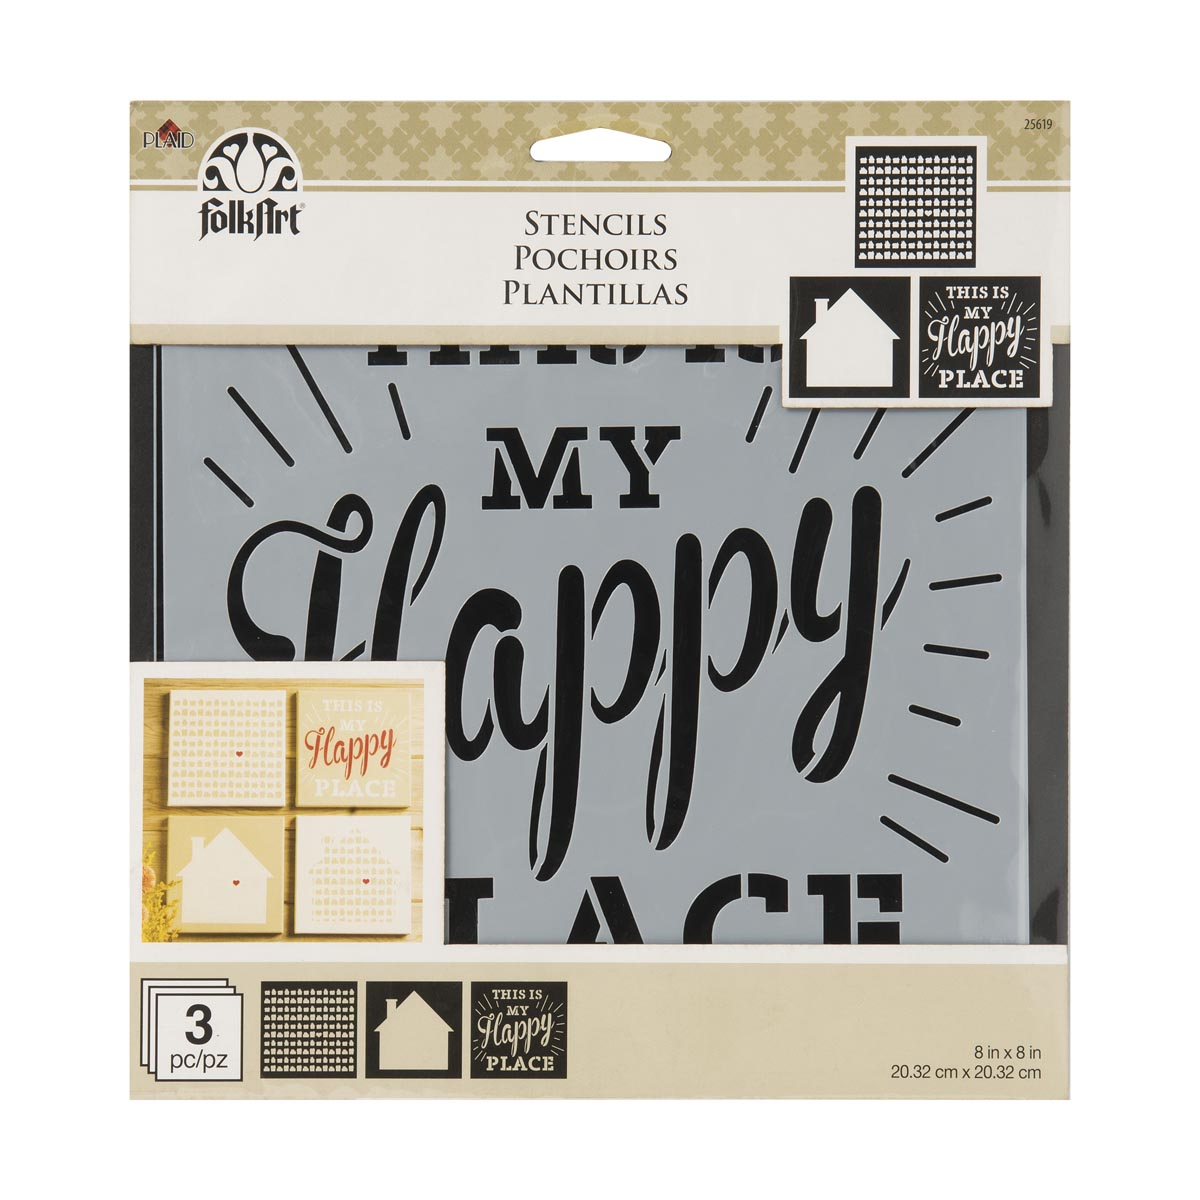 FolkArt ® Craft Stencils - Value Packs - Home Sweet Home - 25619